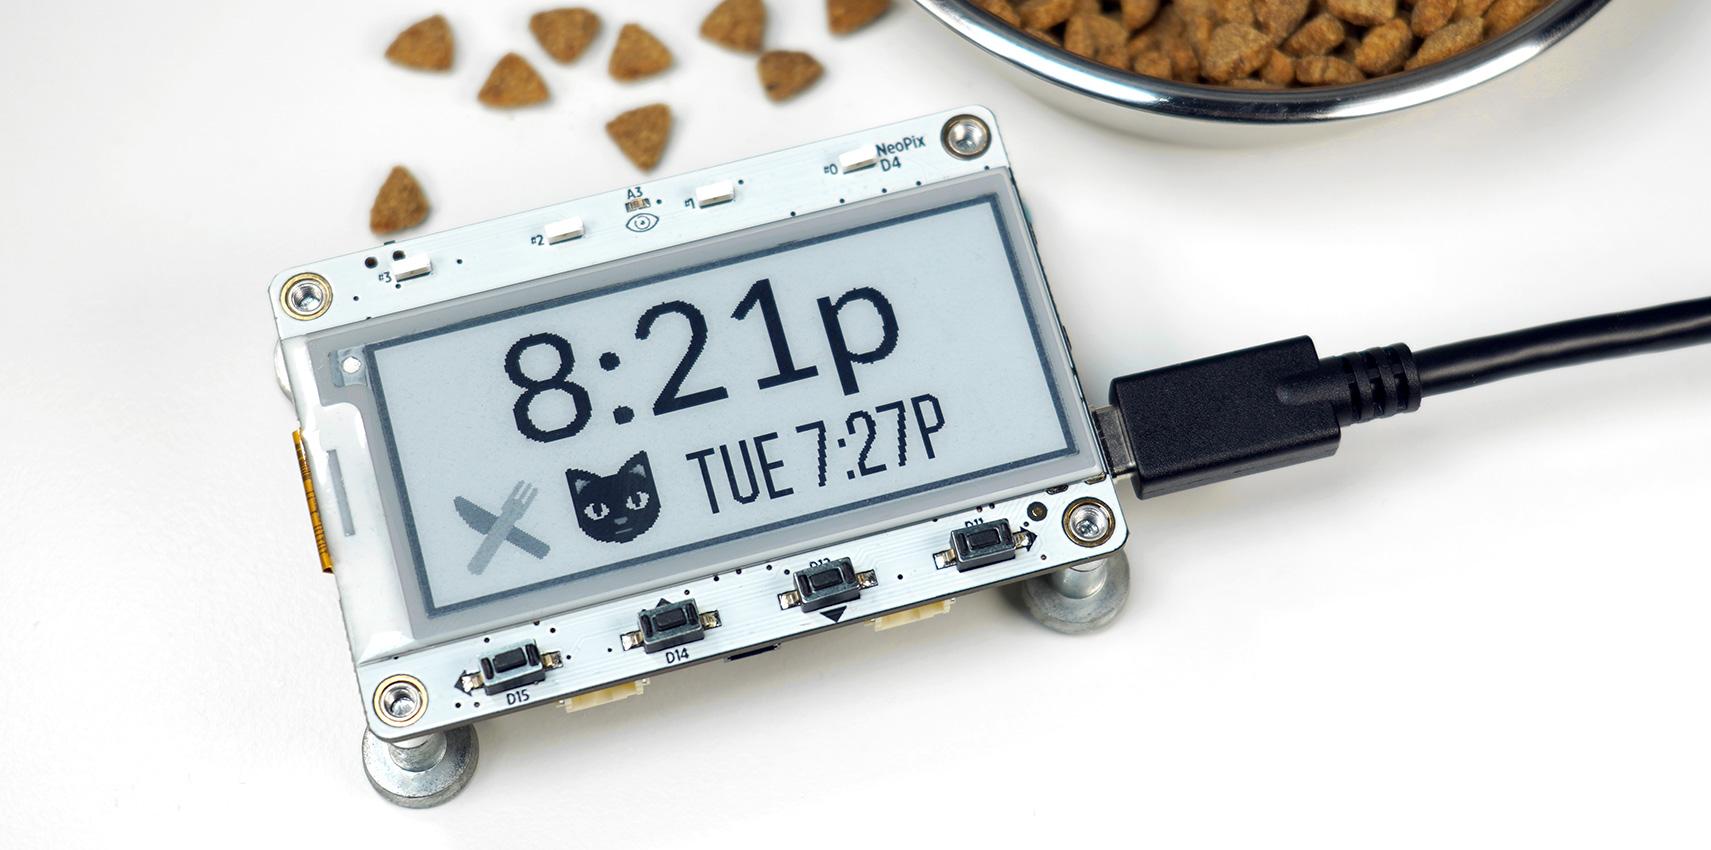 circuitpython_cat_fed_clock2-resize2.jpg